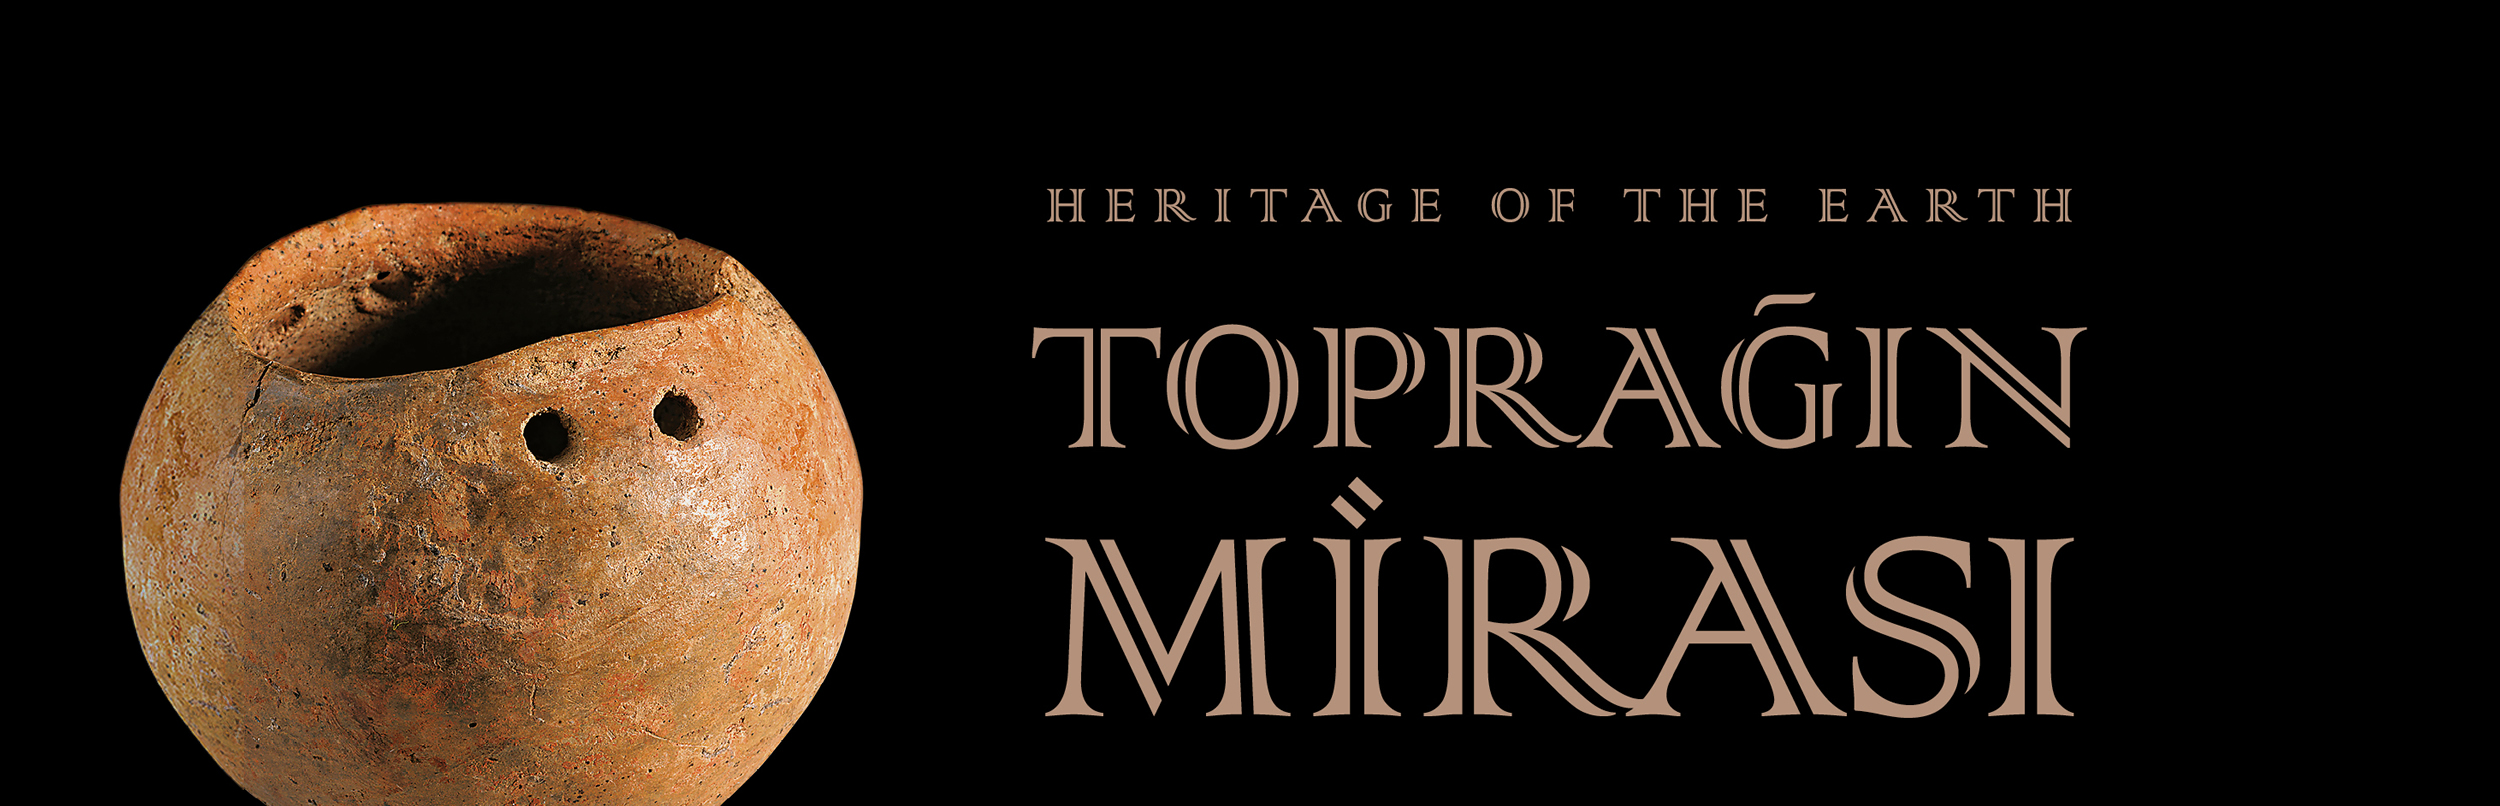 topragin-mirasi-banner